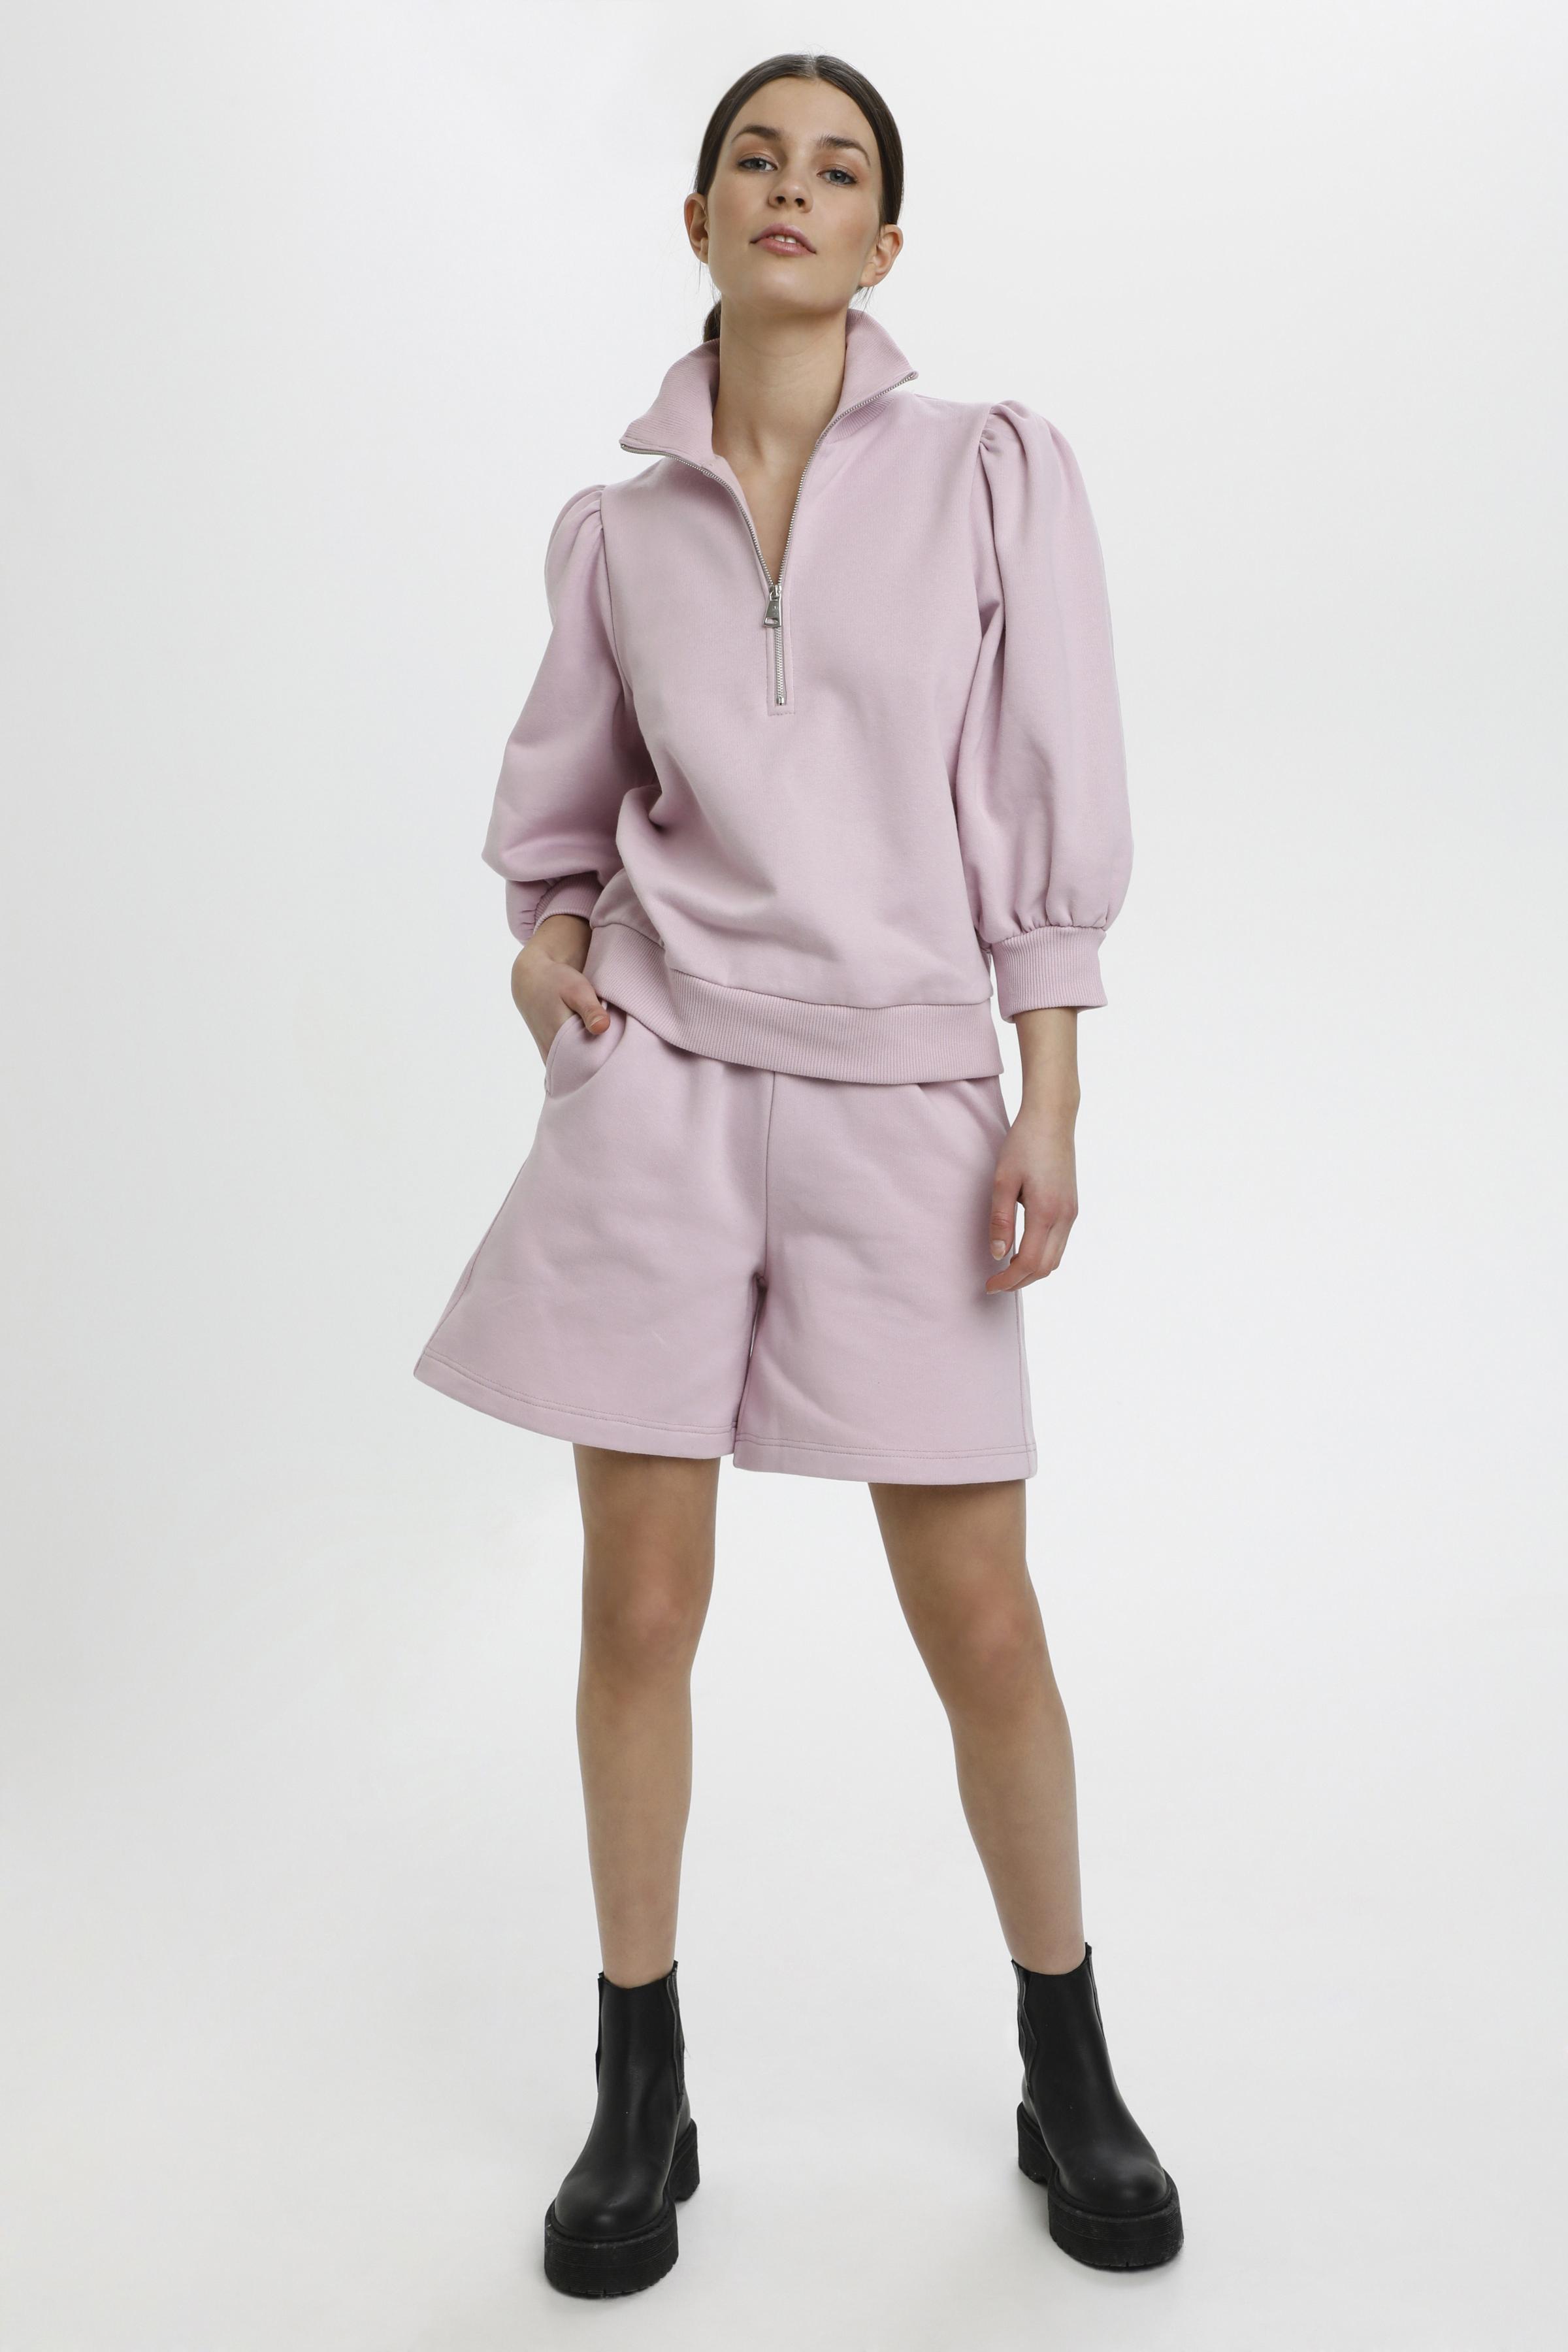 Gestuz NankitaGZ shorts, fragrant lilac, x-large